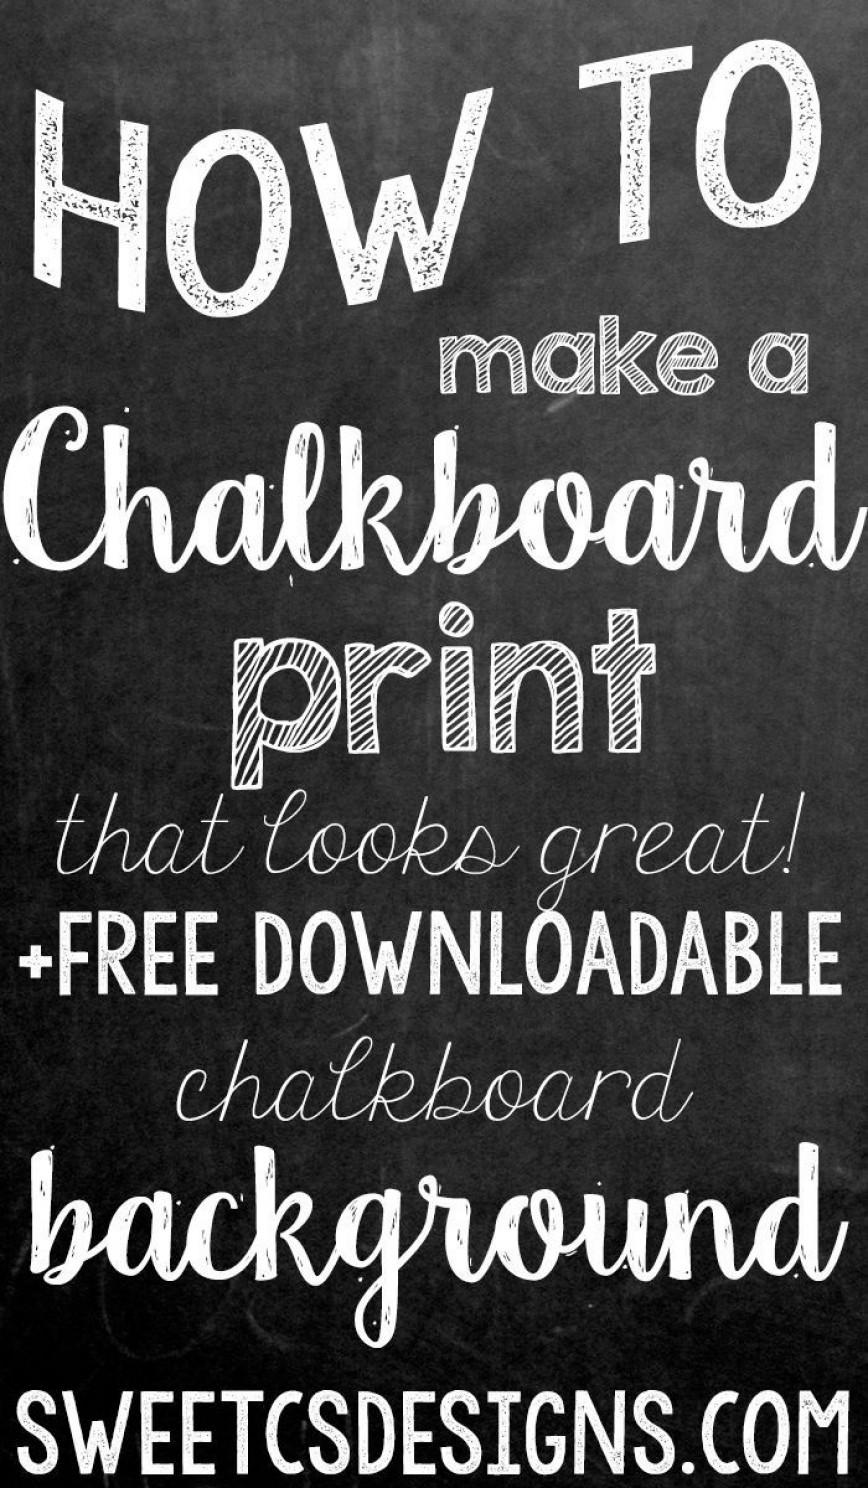 000 Beautiful Chalkboard Template Microsoft Word Example  Editable